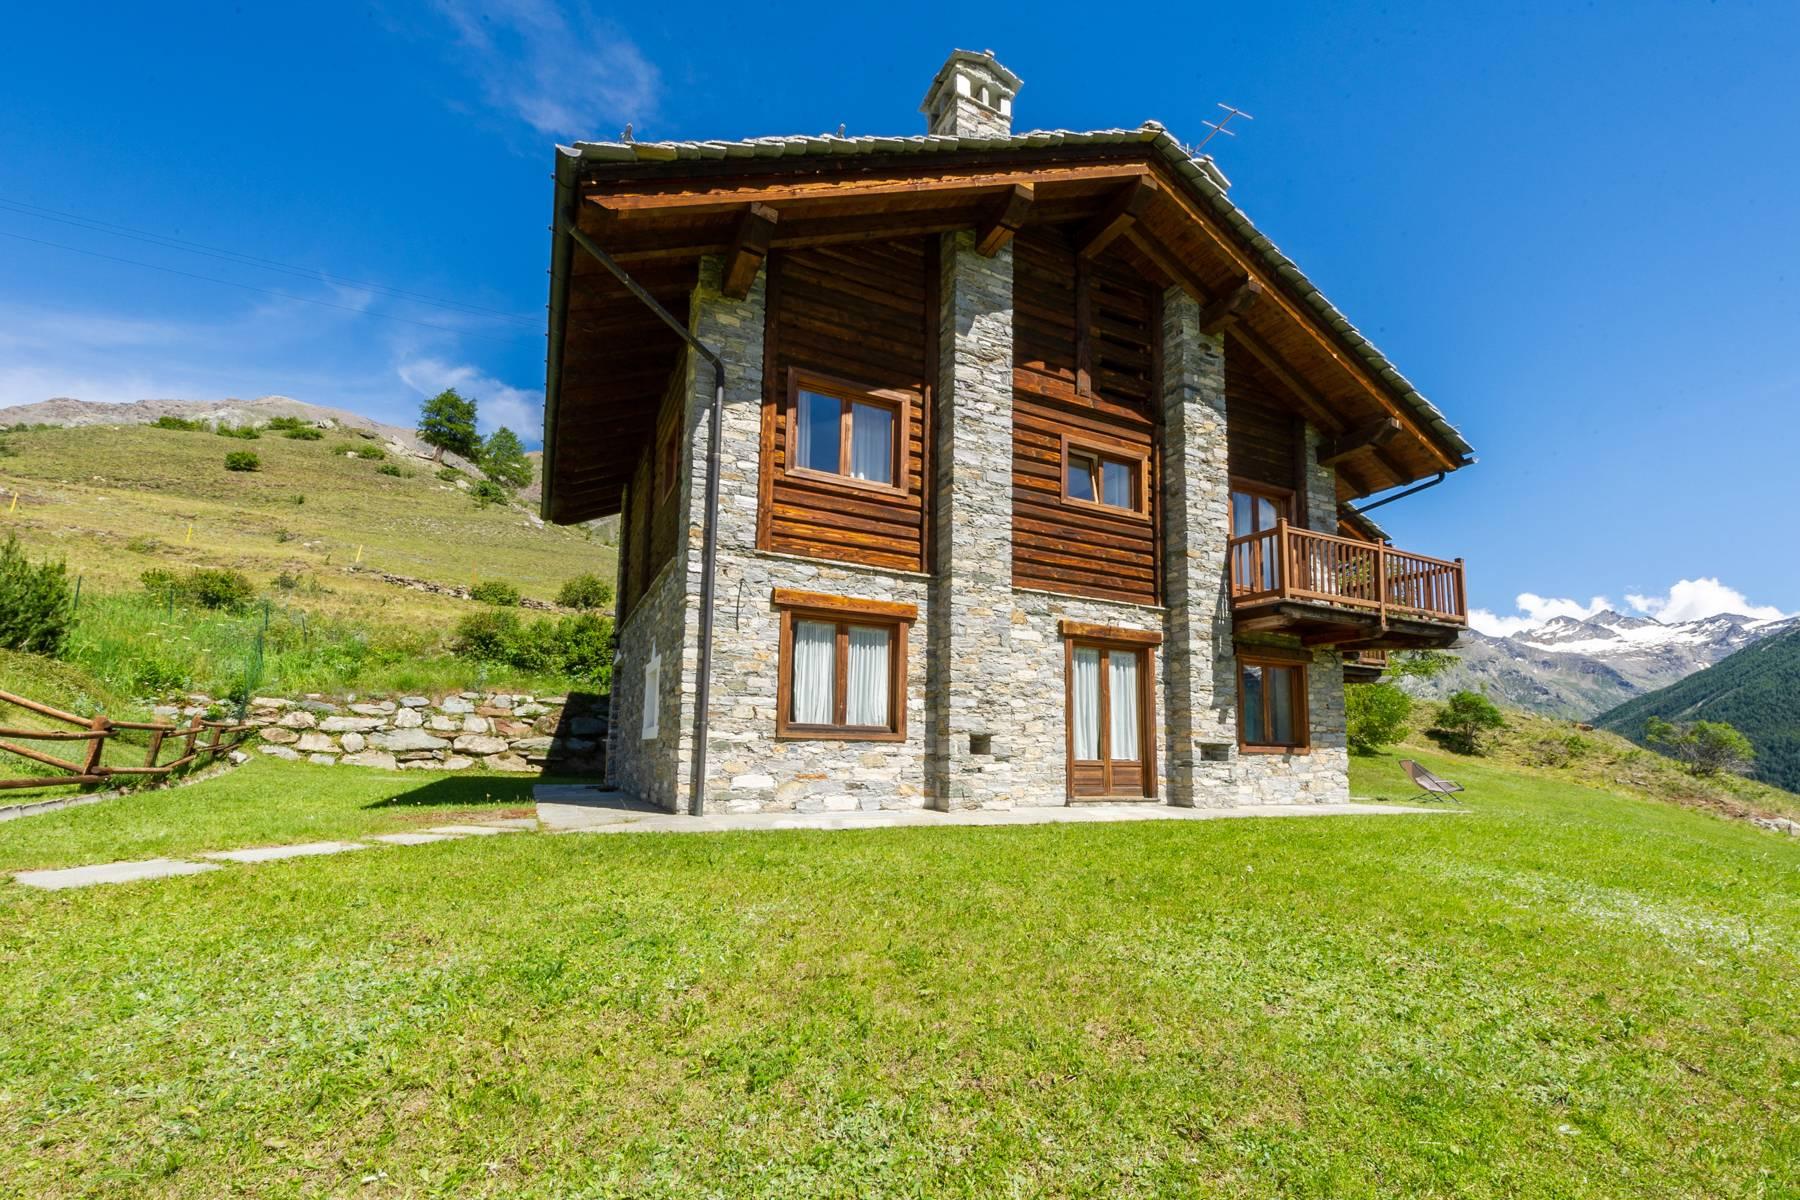 Villa in Vendita a Cogne frazione gimillan